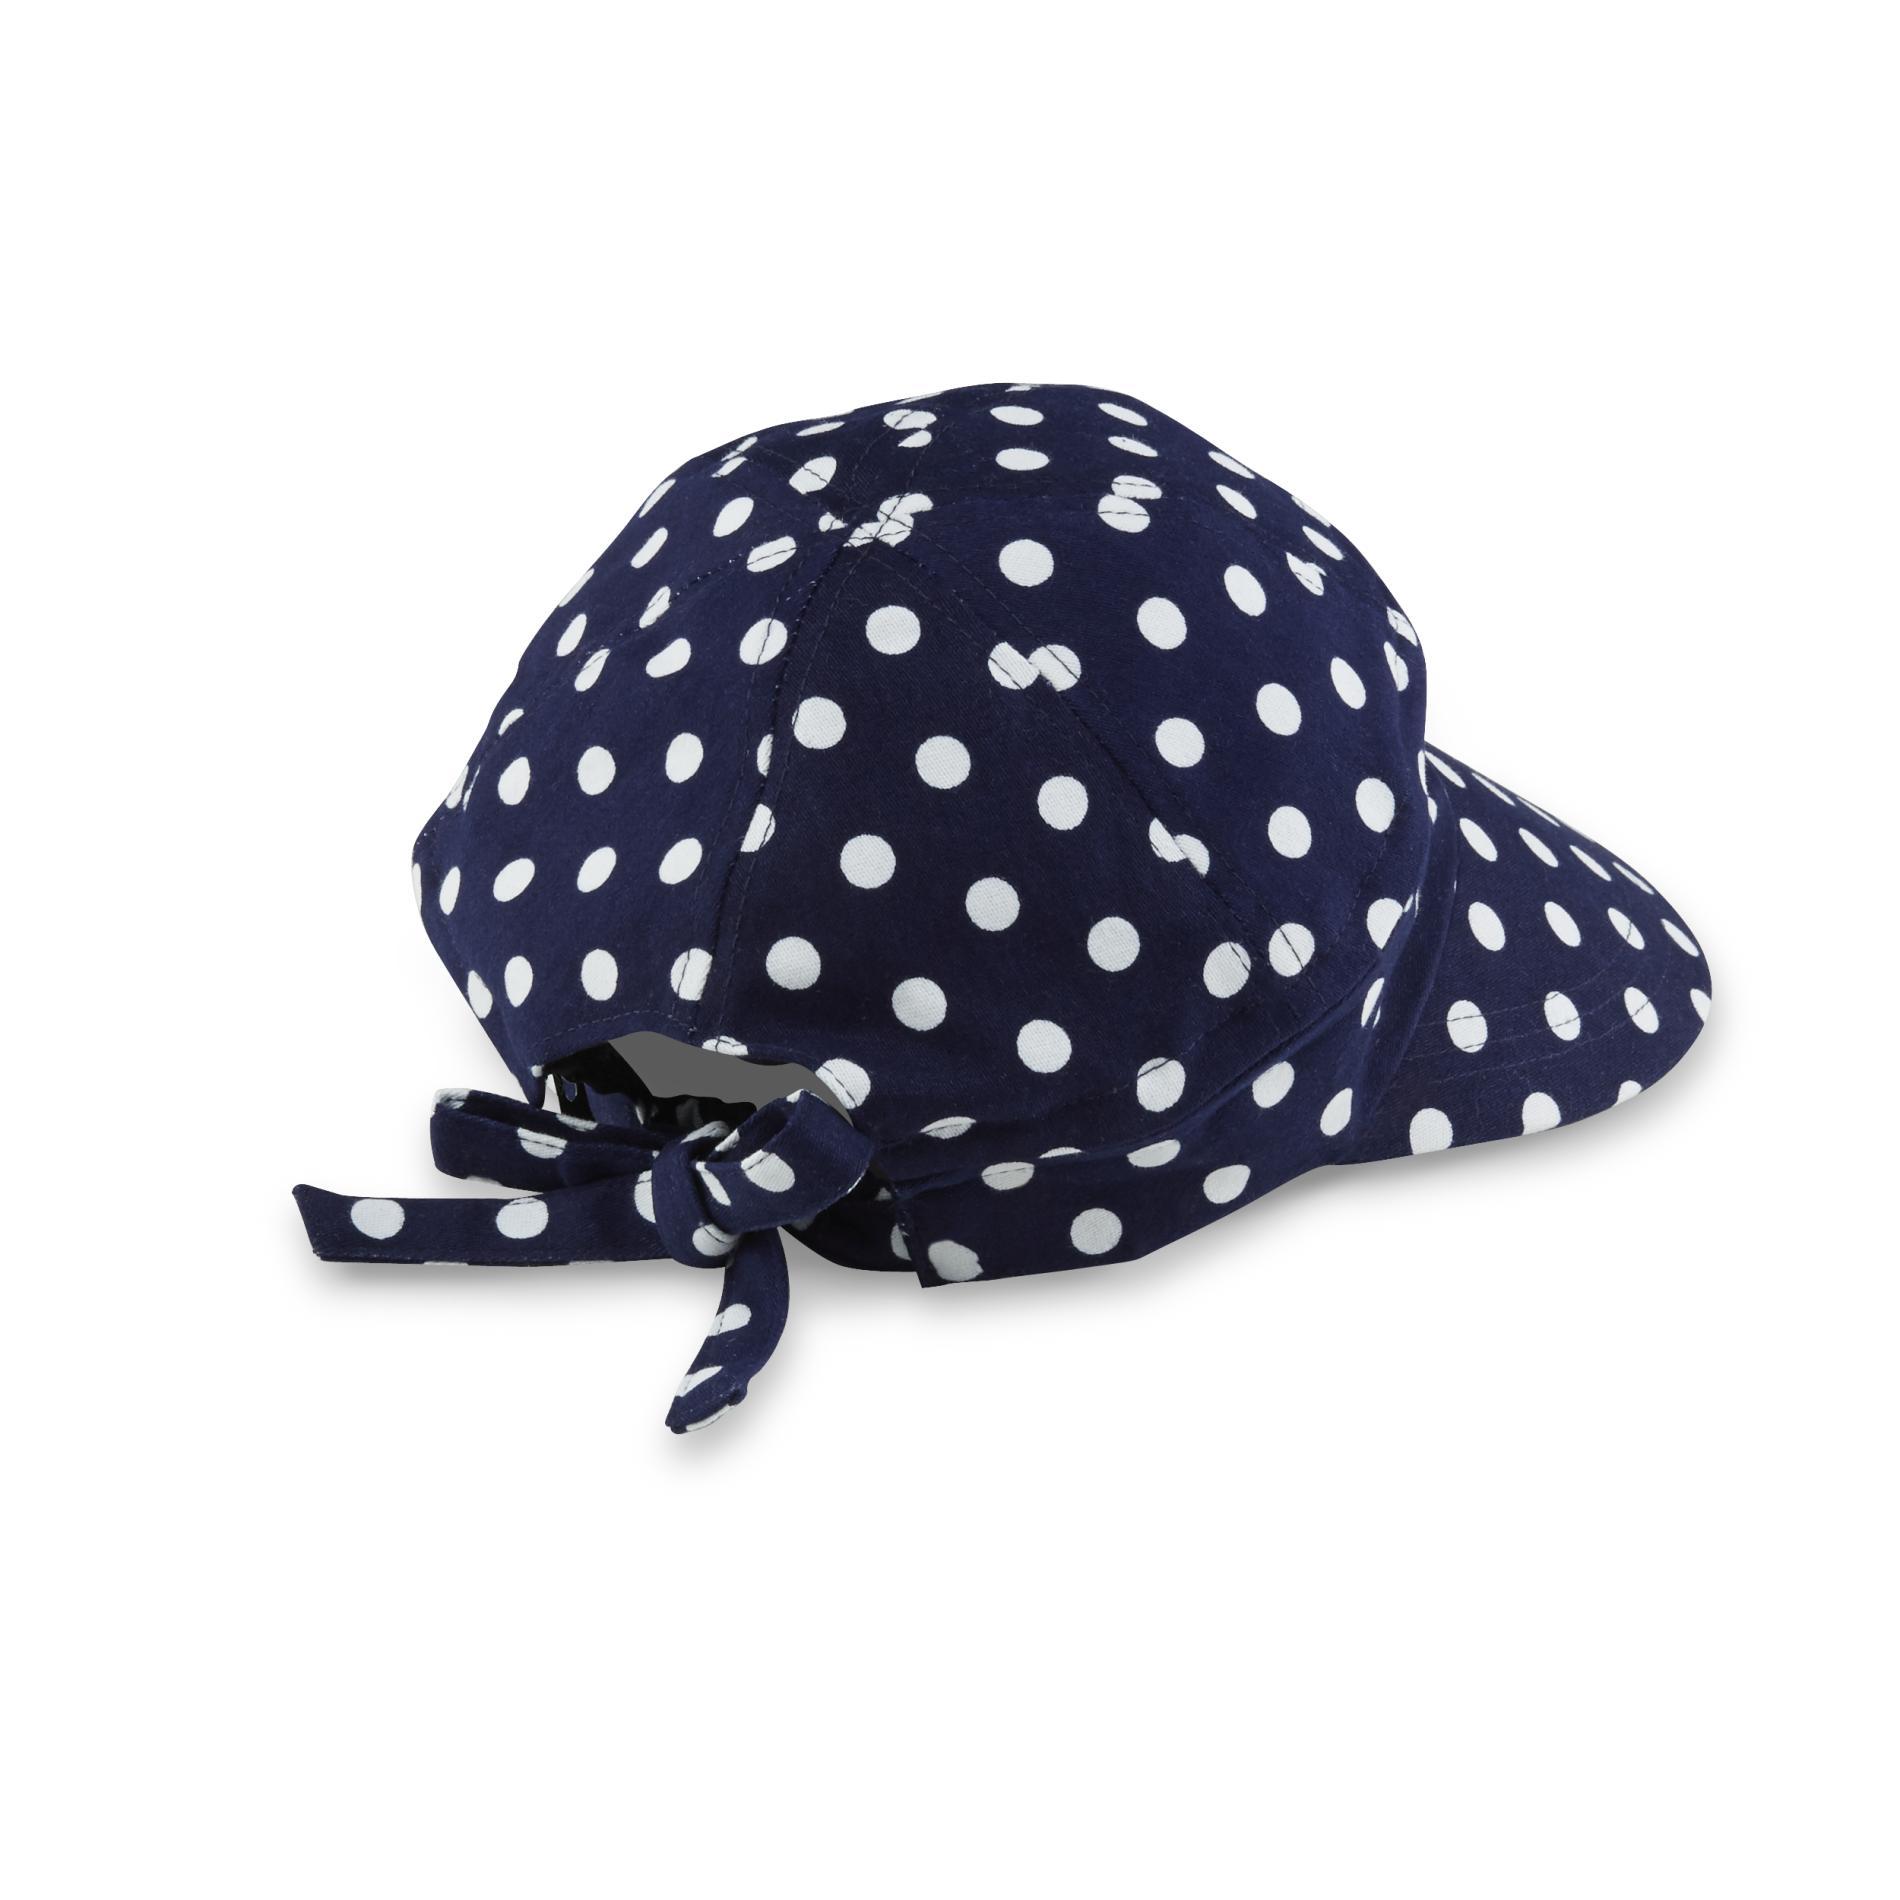 Basic Editions Women's Convertible Face Framer Hat - Polka Dot